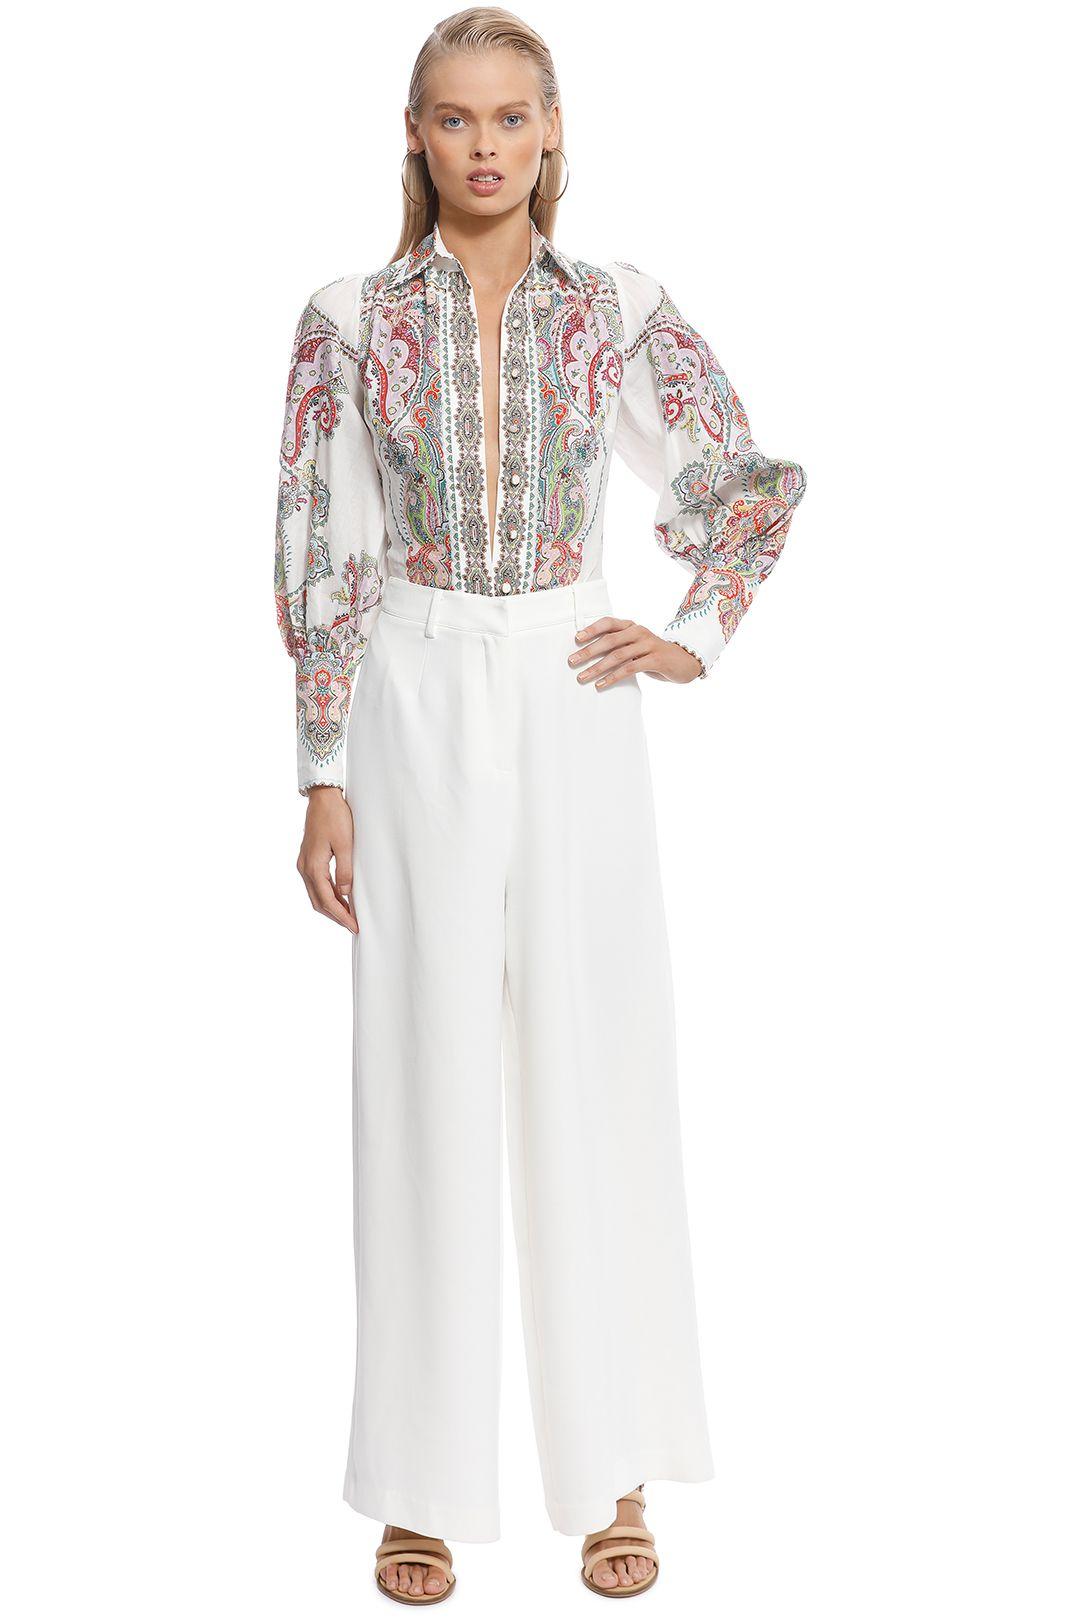 Zimmermann - Ninety-Six Filigree Shirt - White Print - Front